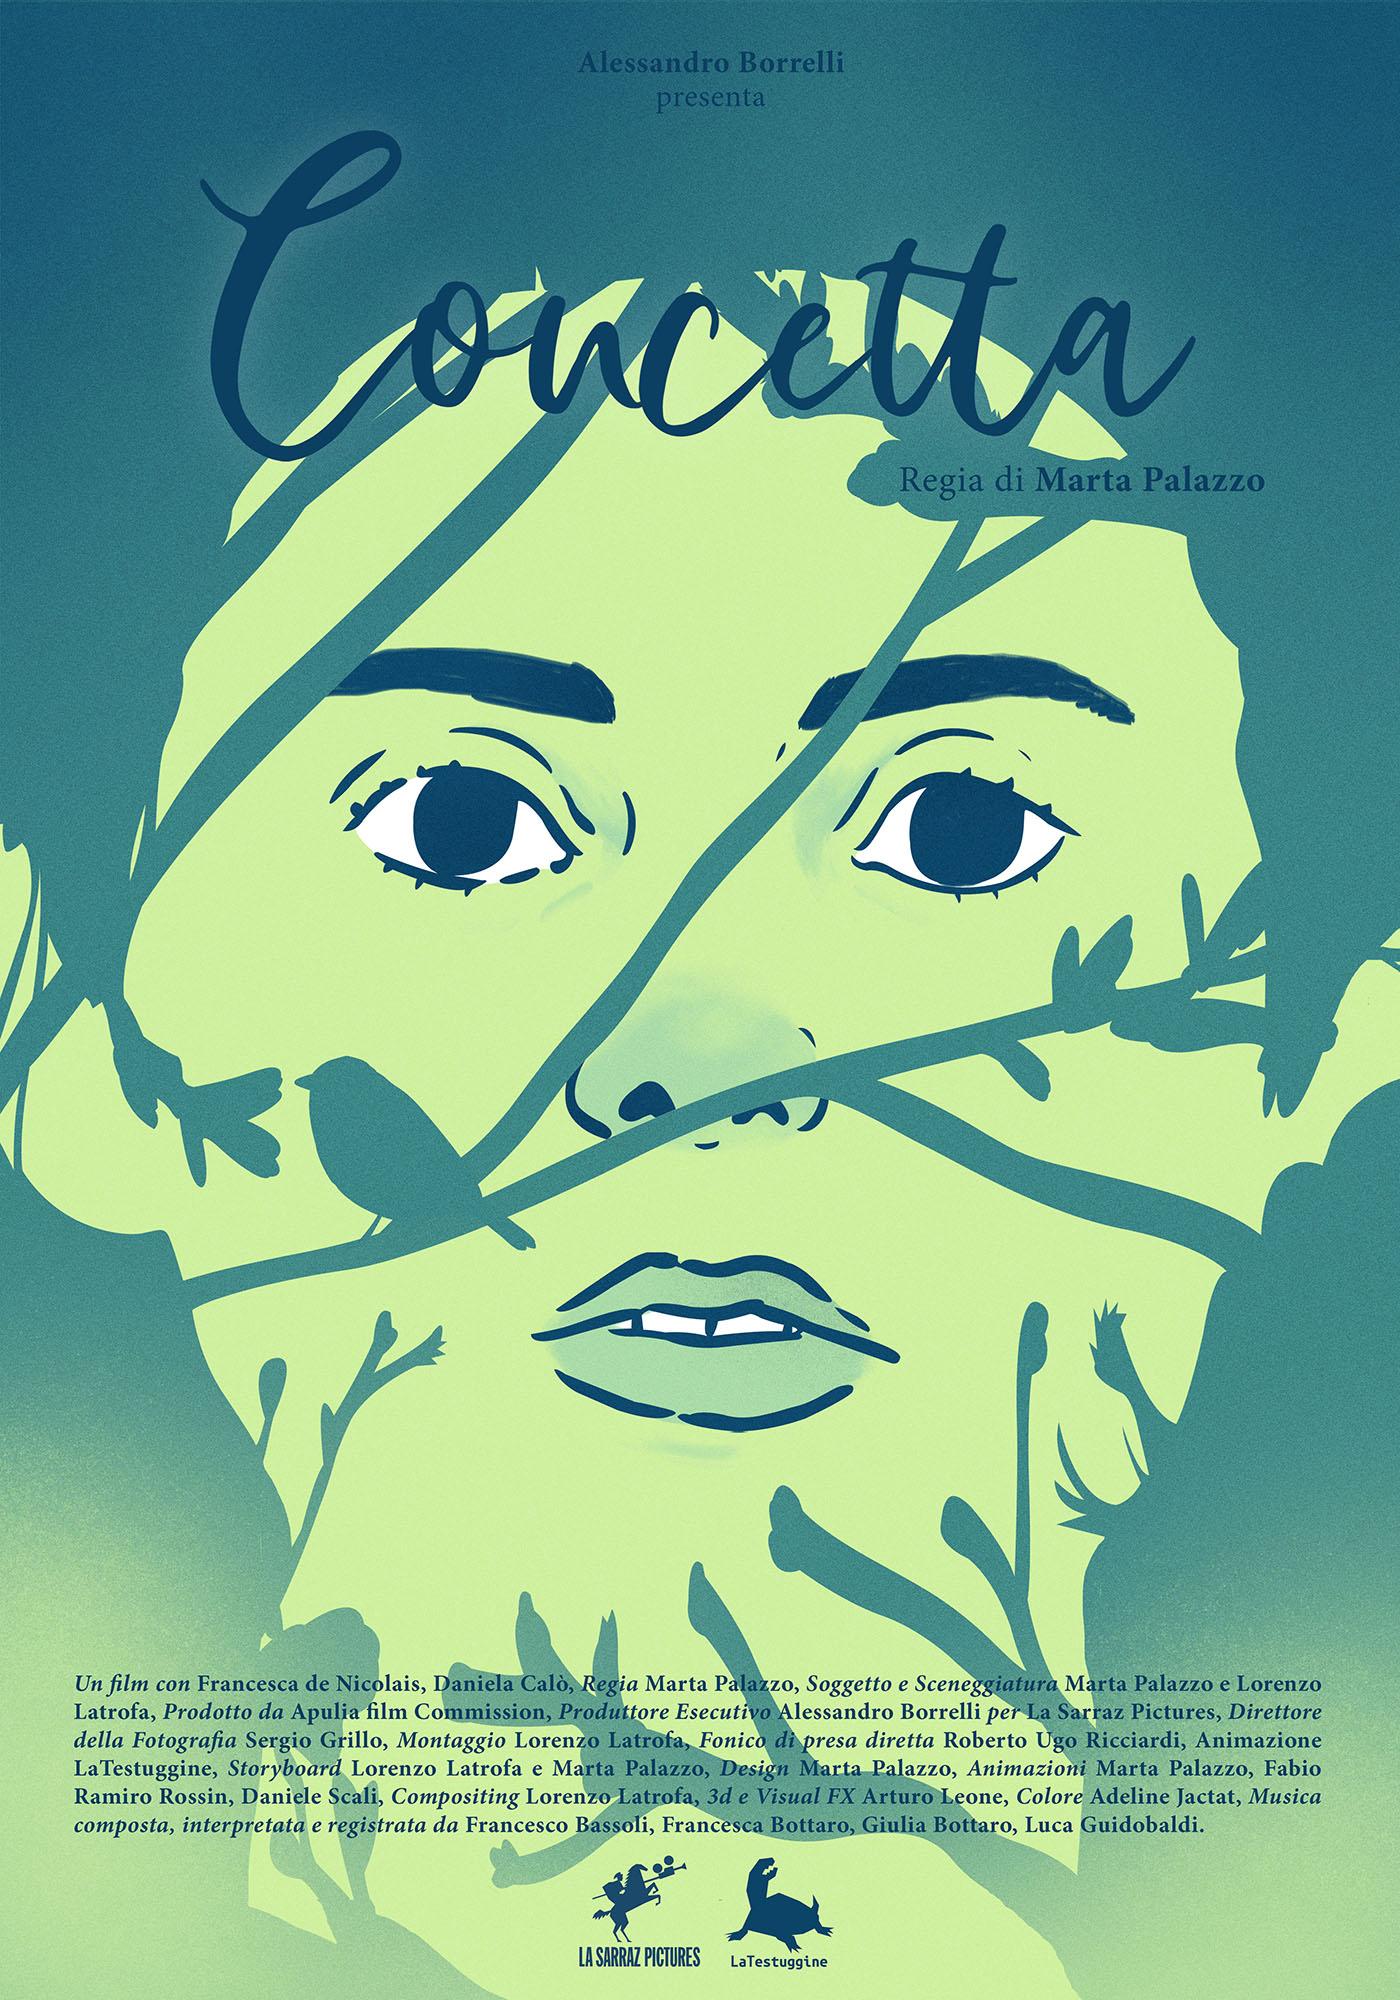 CONCETTA_locandina_NEW_LOW